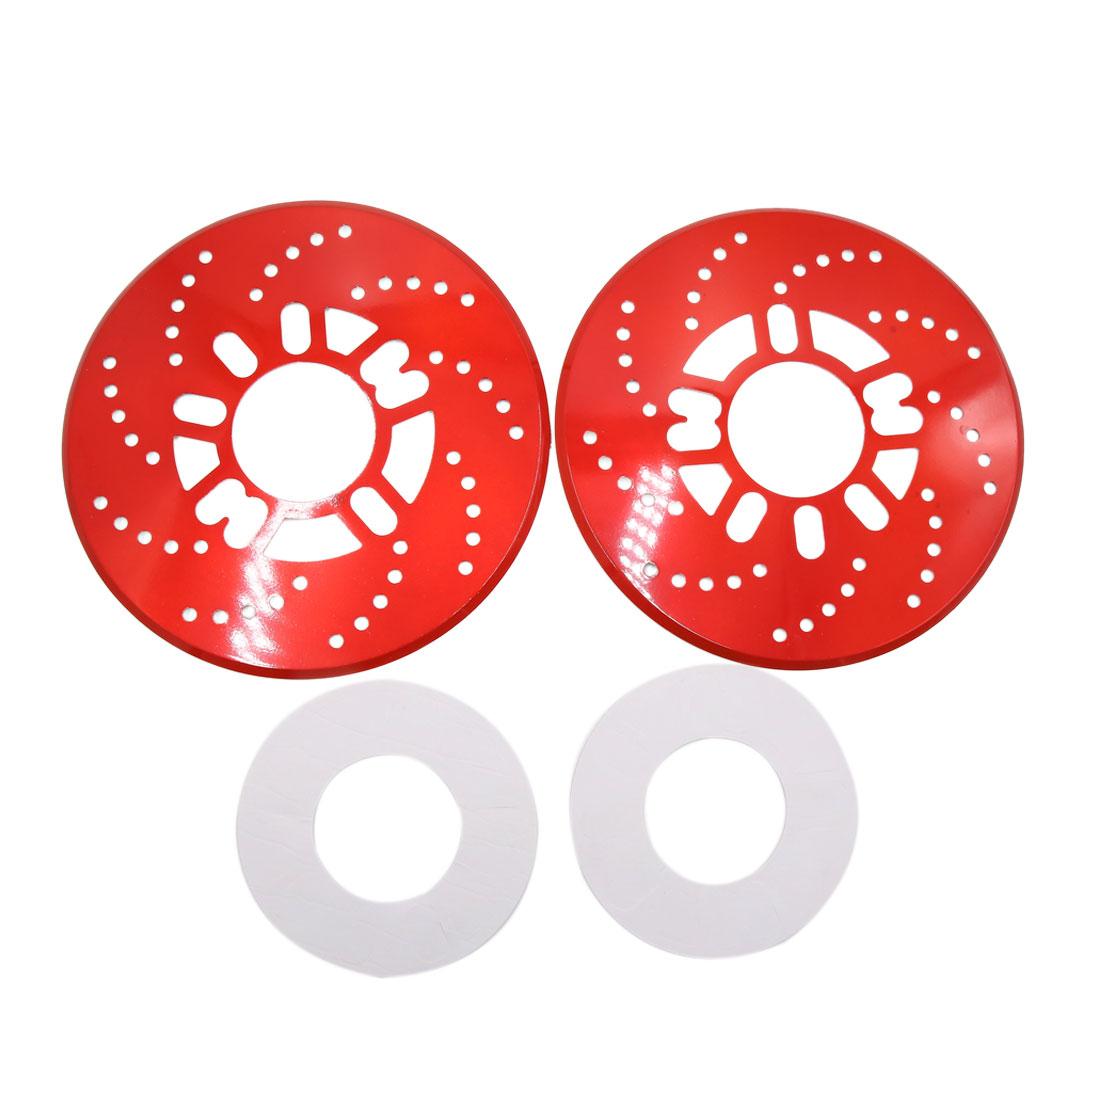 2Pcs Red Metal Vehcile Car Wheel Disc Brake Racing Cover Decoration